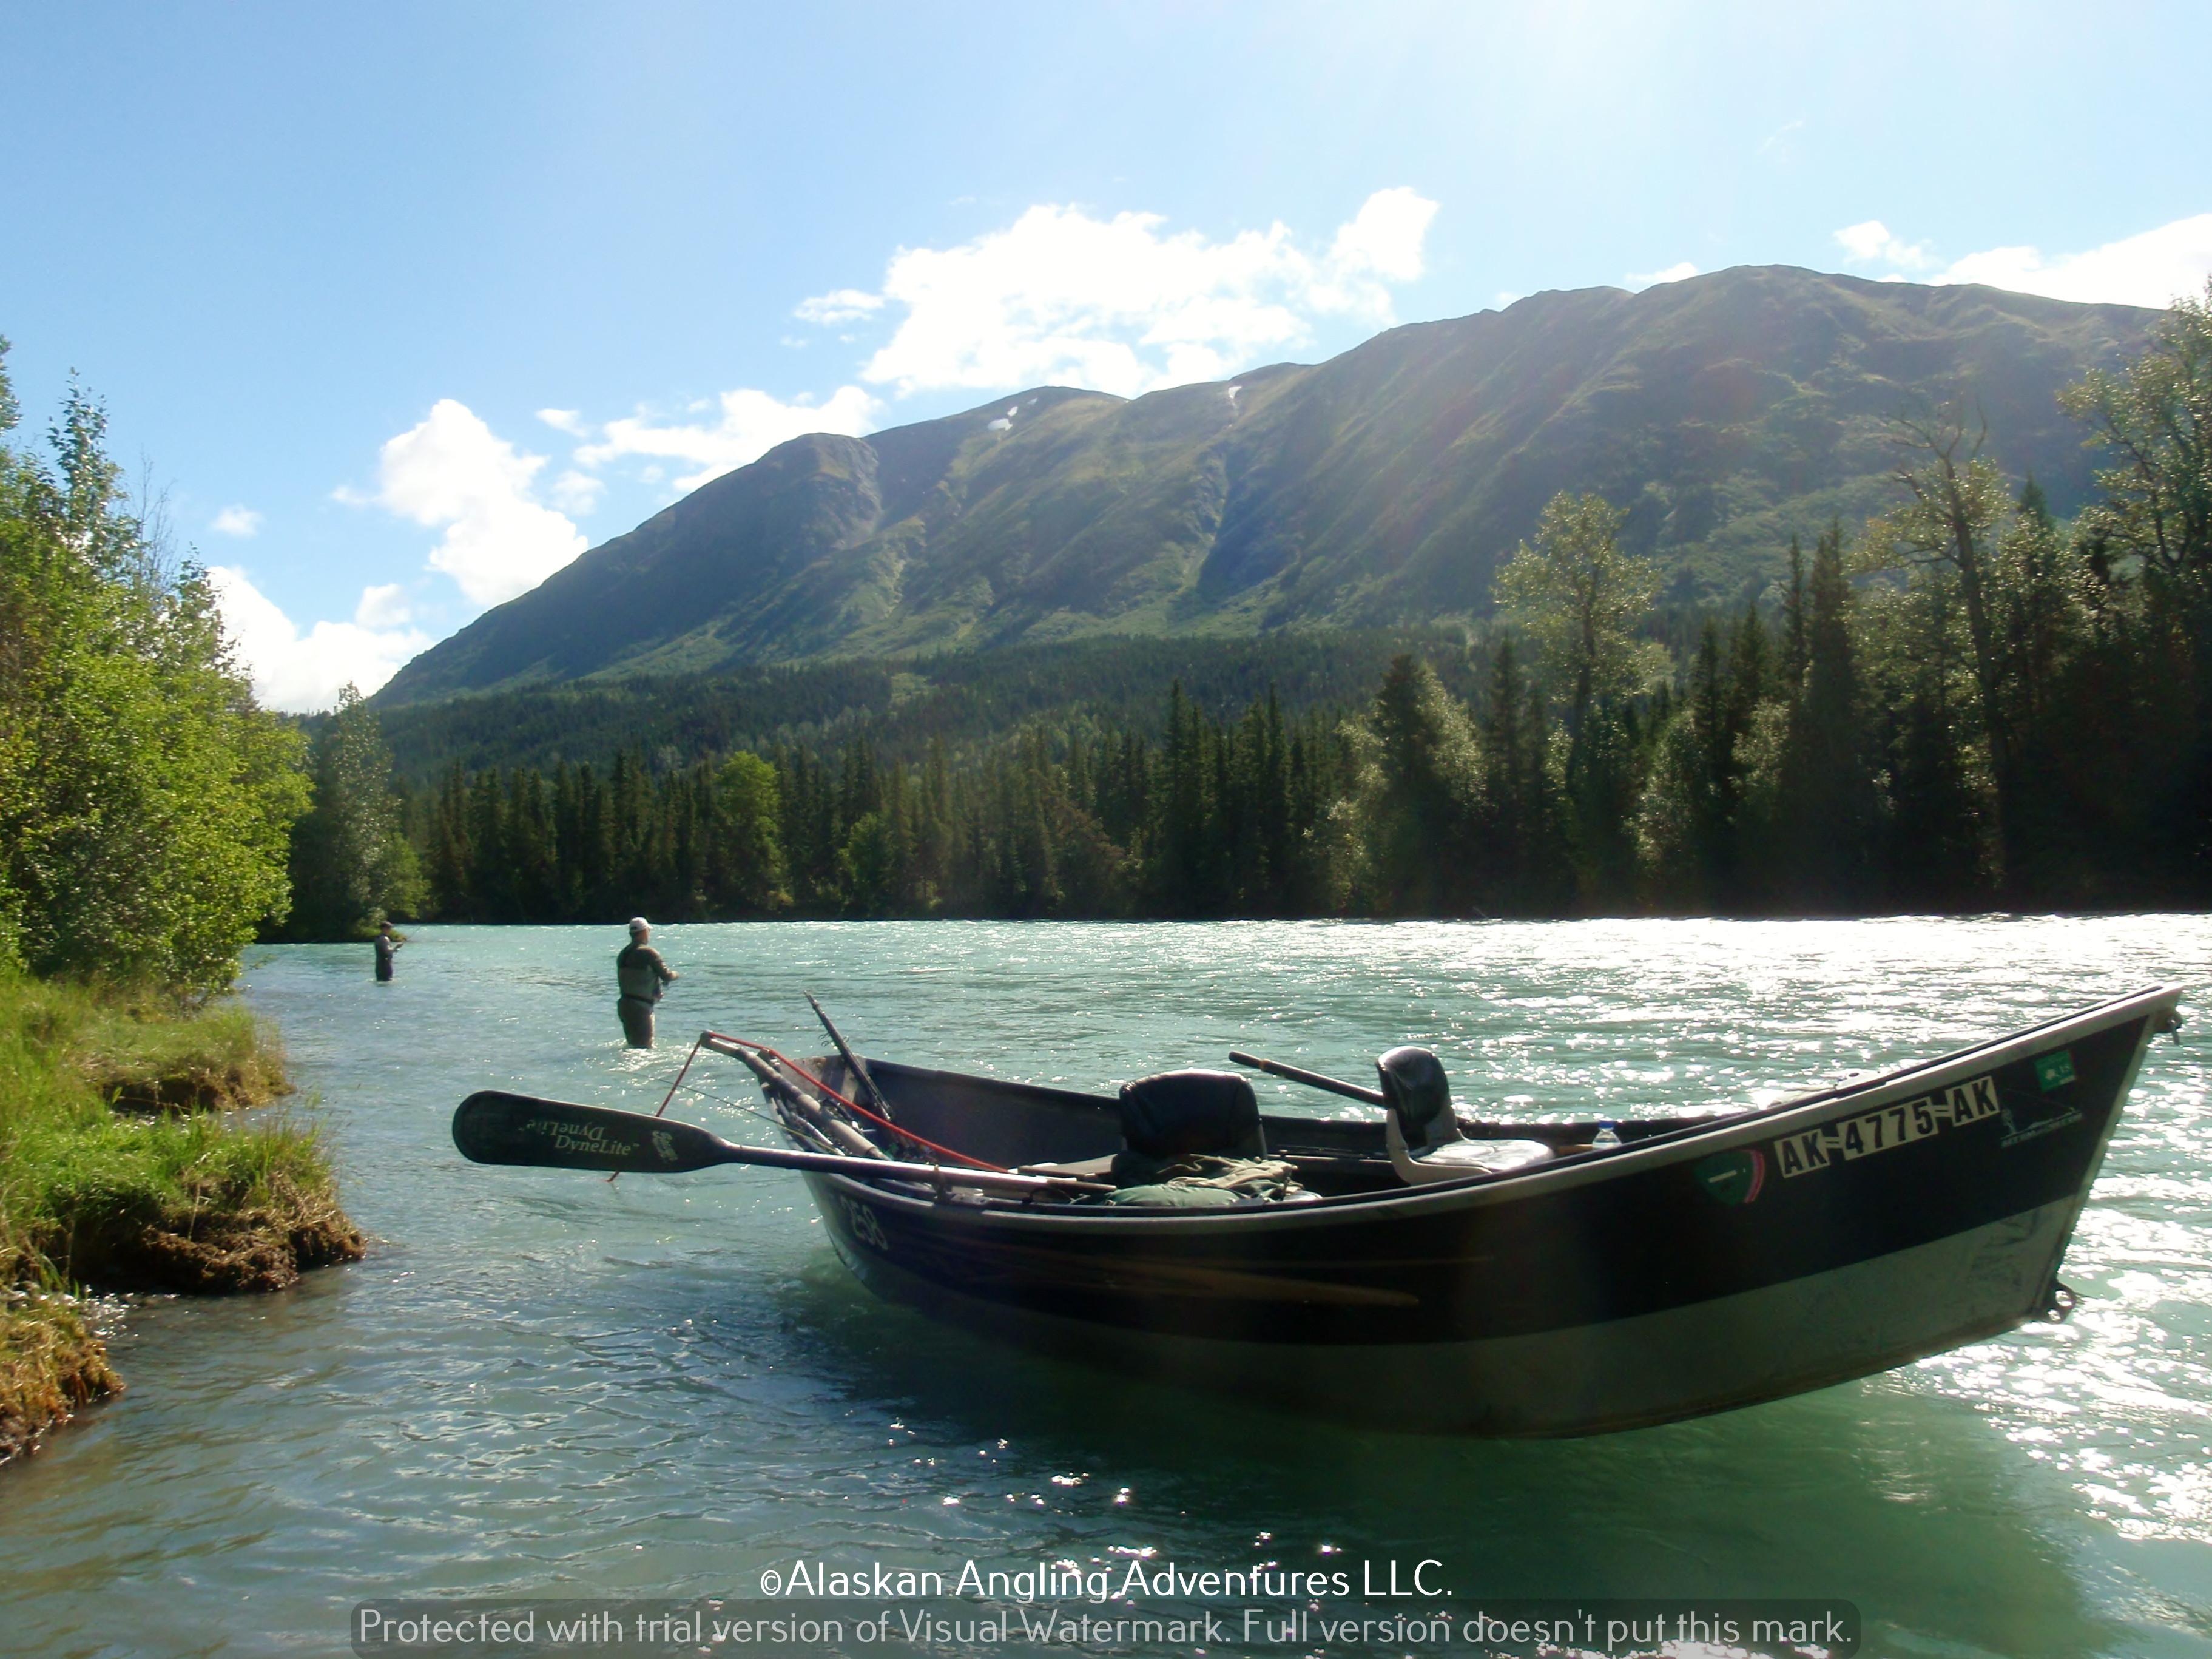 Alaskan Angling Adventures Llc.: Half Day Upper Kenai River Fishing Trip